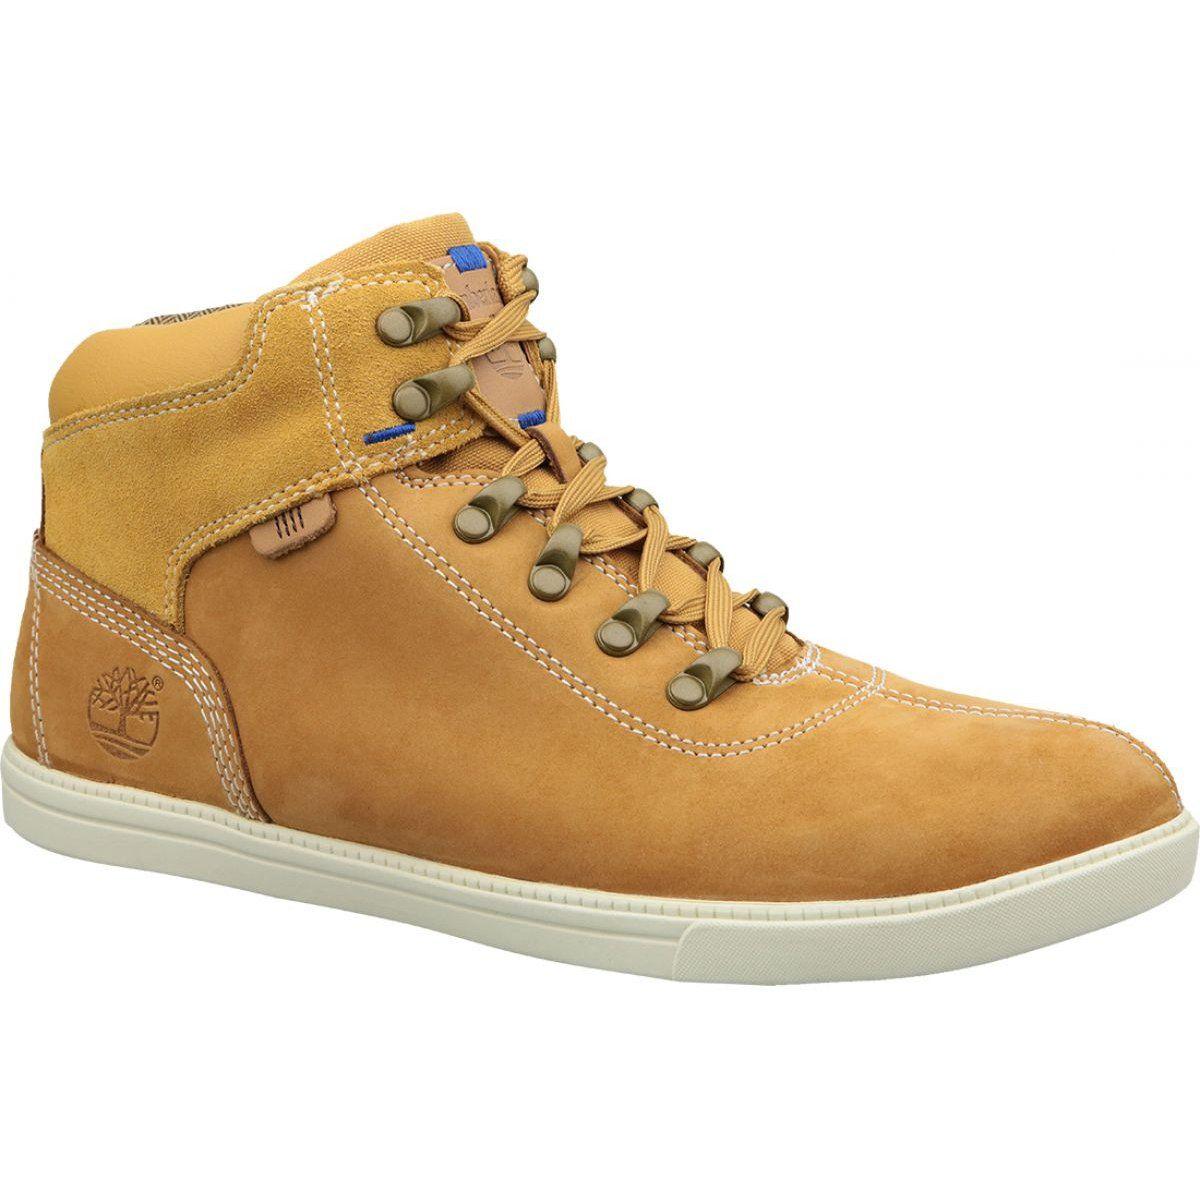 Buty Timberland Ek Fulk Hiker M 6805a Pomaranczowe Timberland High Top Sneakers Top Sneakers